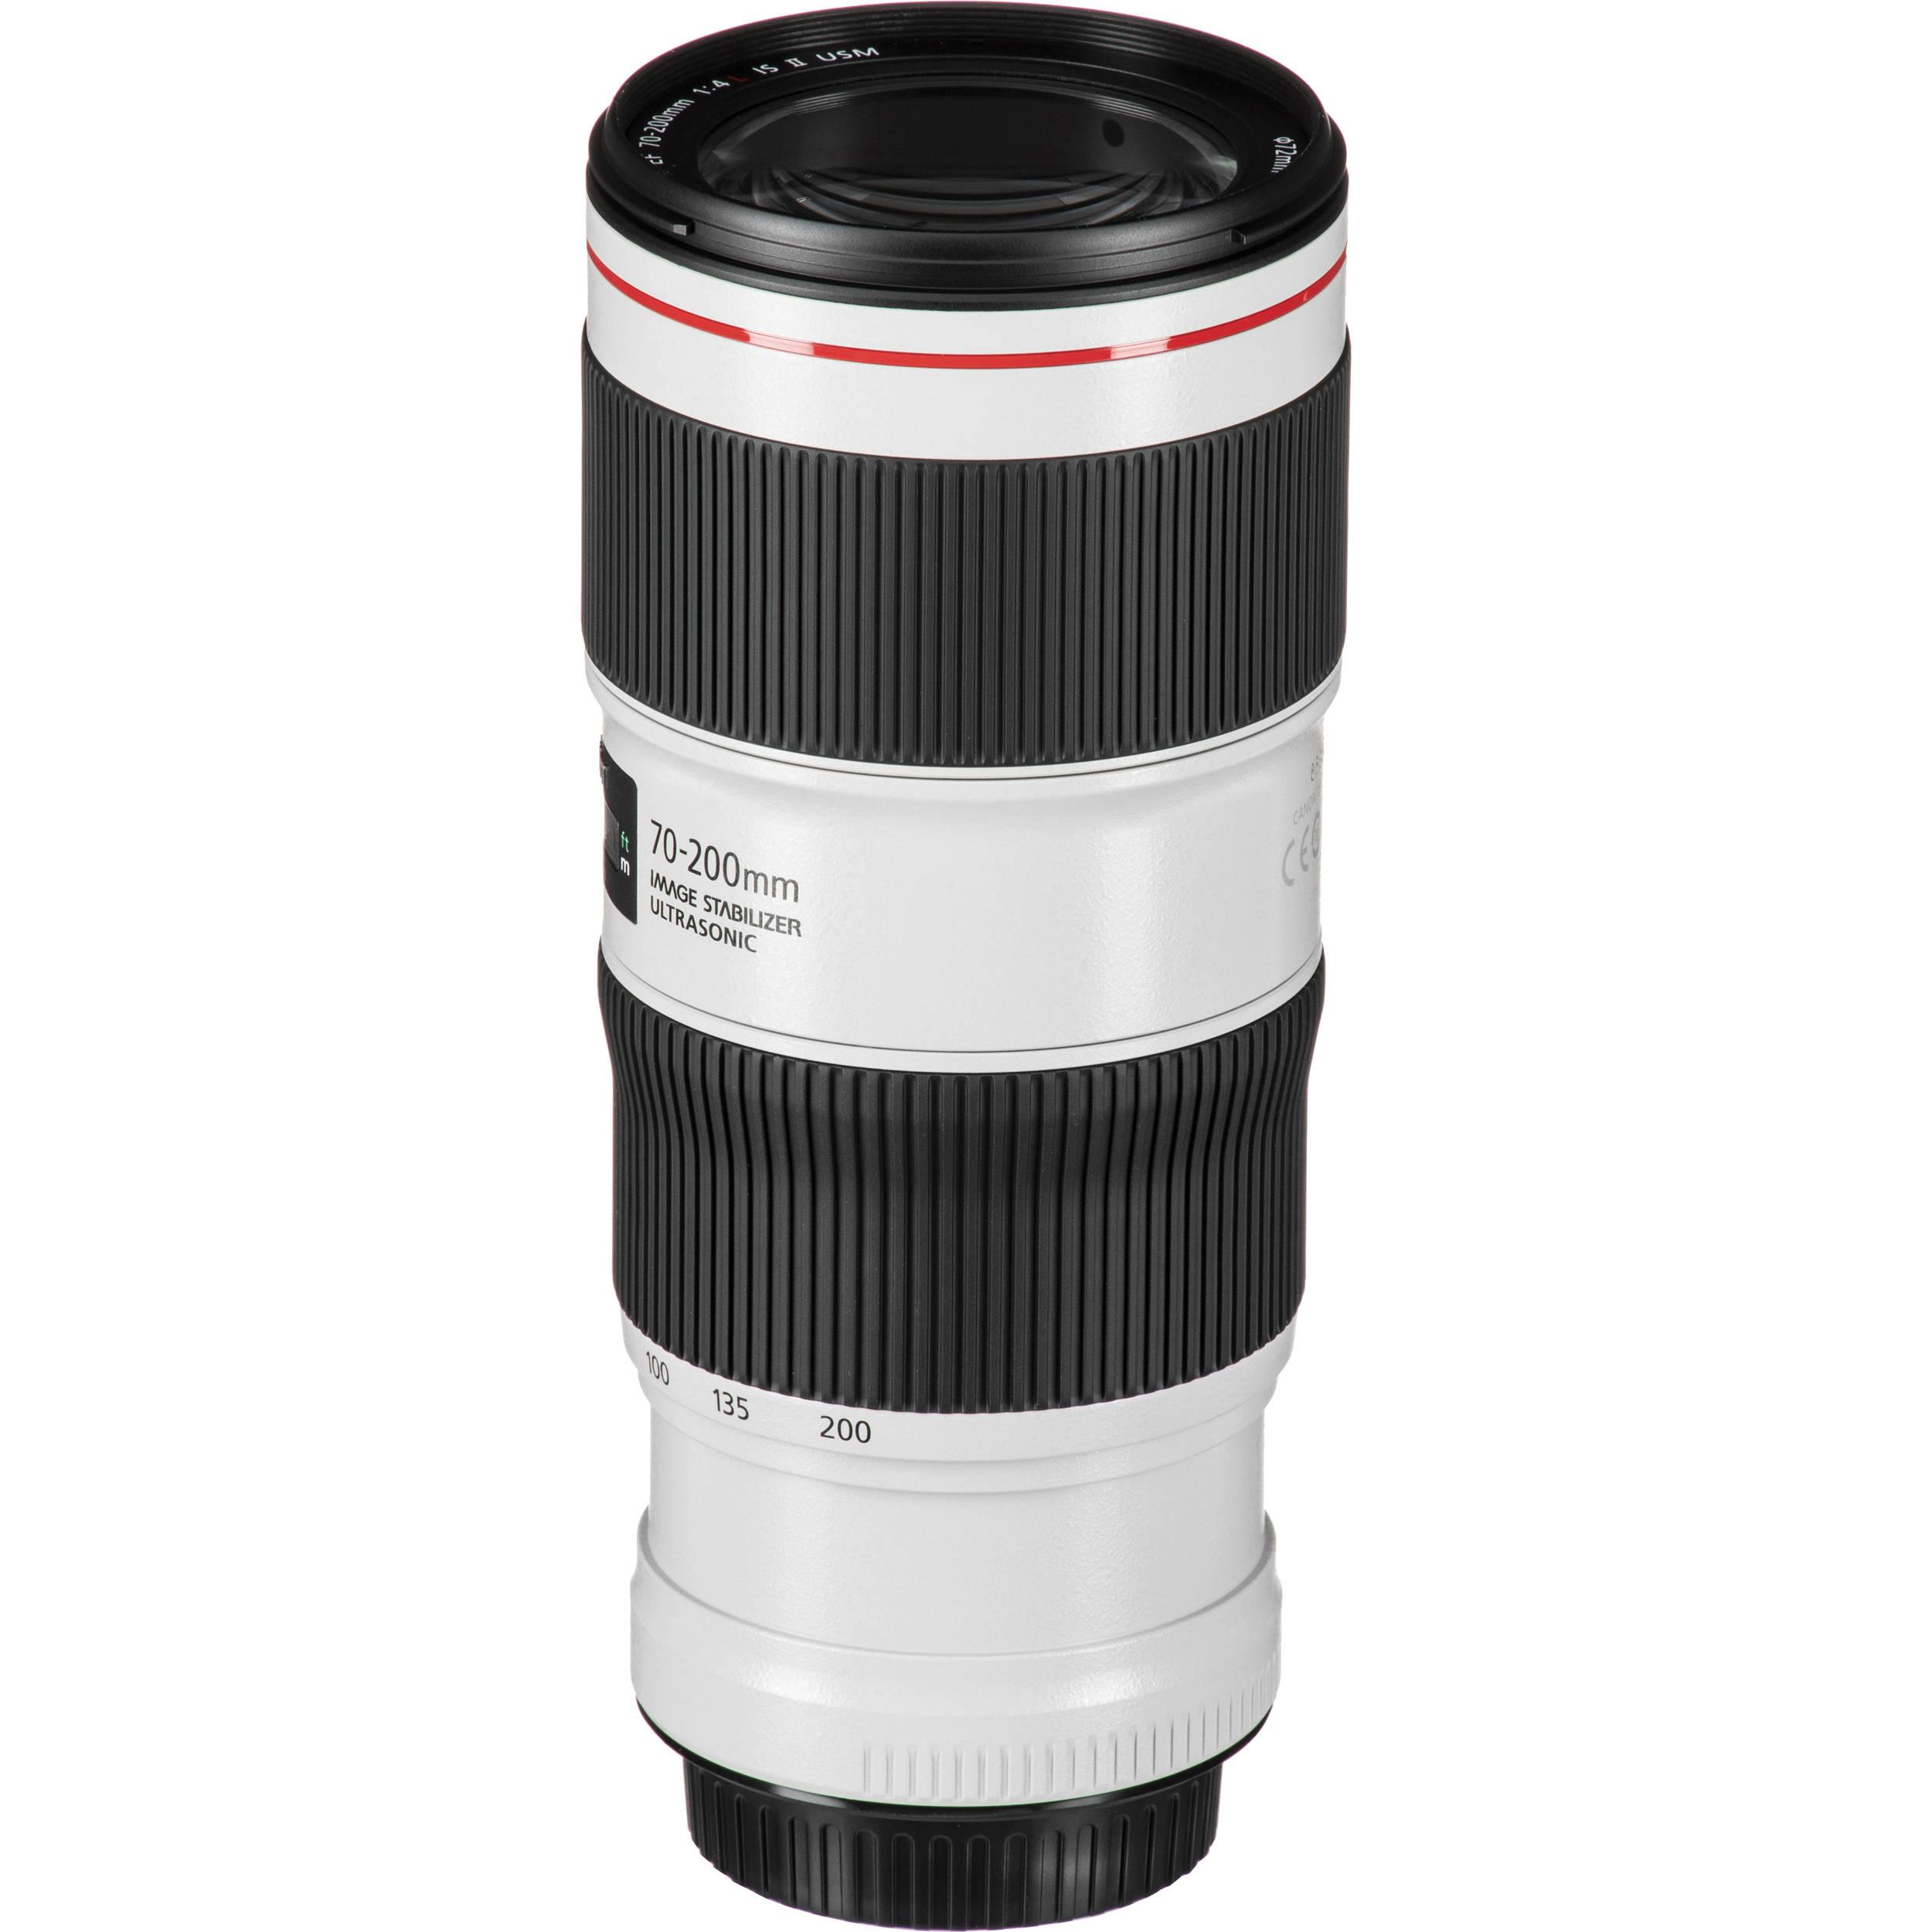 Canon EF 70-200mm f/4L IS II USM Lens 2309C002 B&H Photo Video